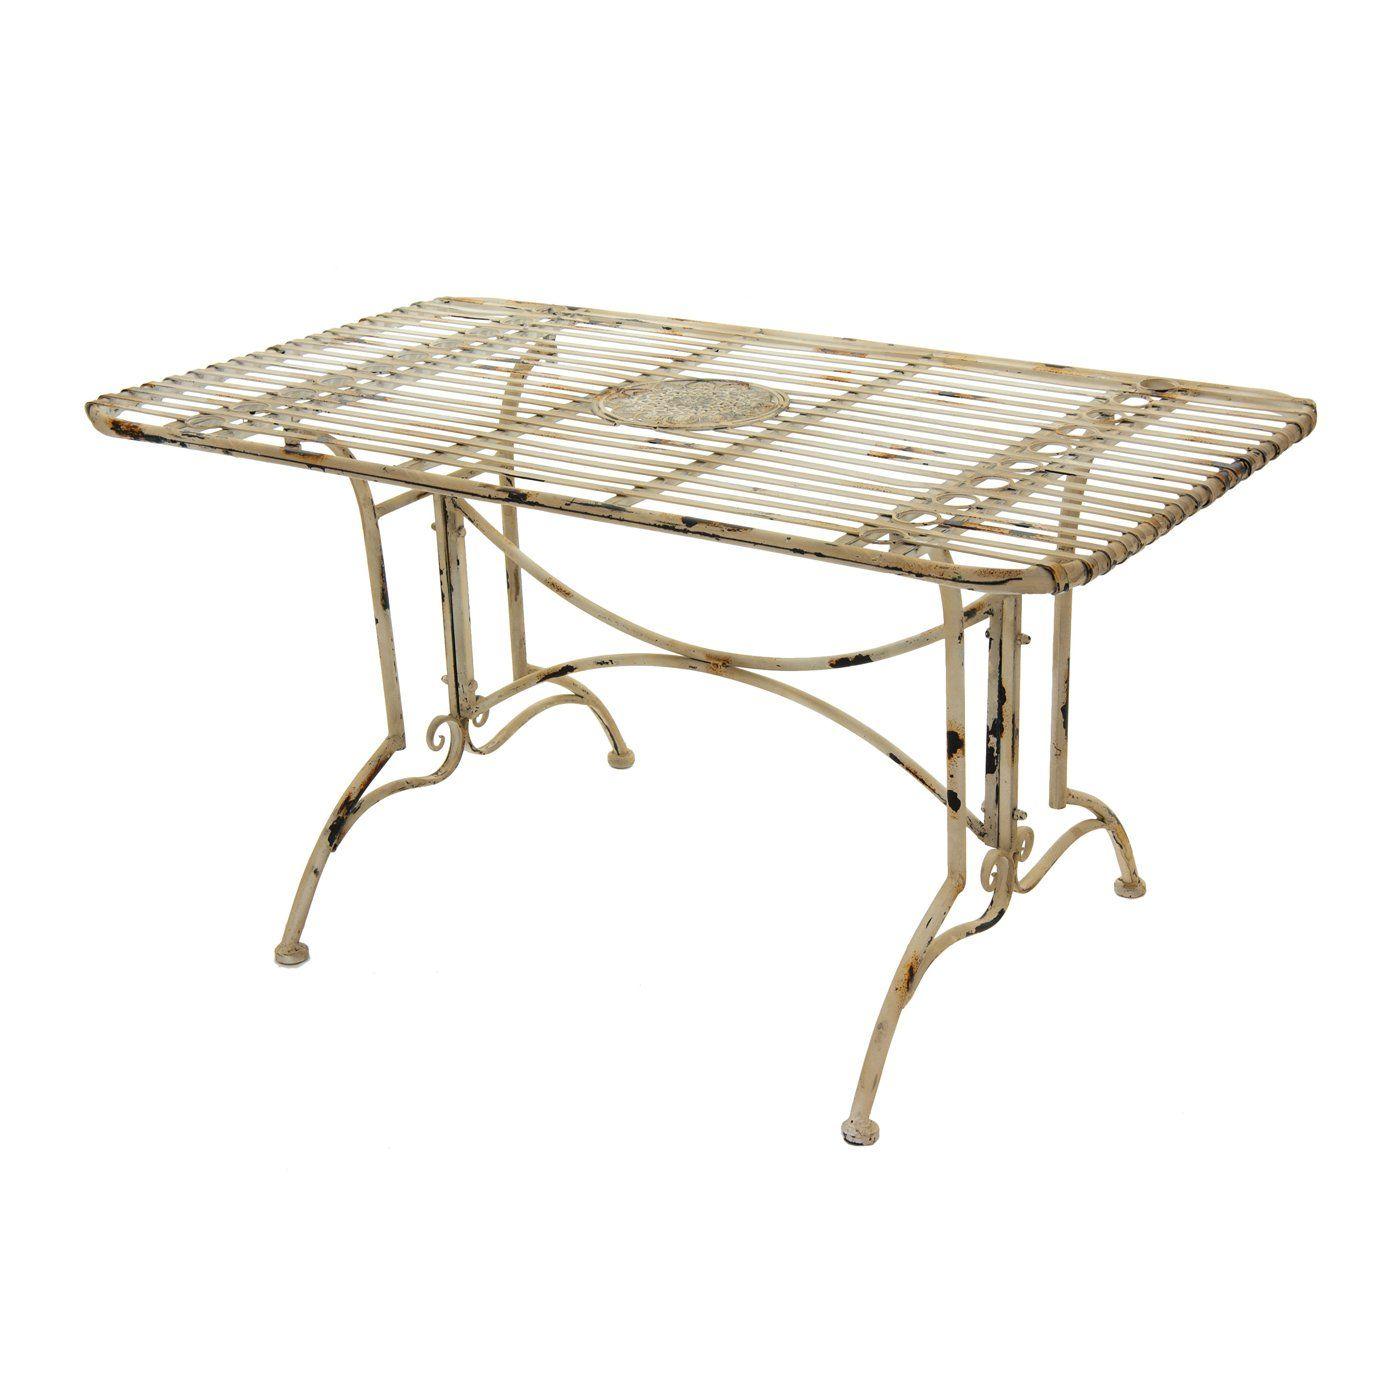 oriental outdoor furniture. Shop Oriental Furniture GF-TABLE2 Rustic Rectangular Garden Table At ATG  Stores. Browse Our Oriental Outdoor Furniture T